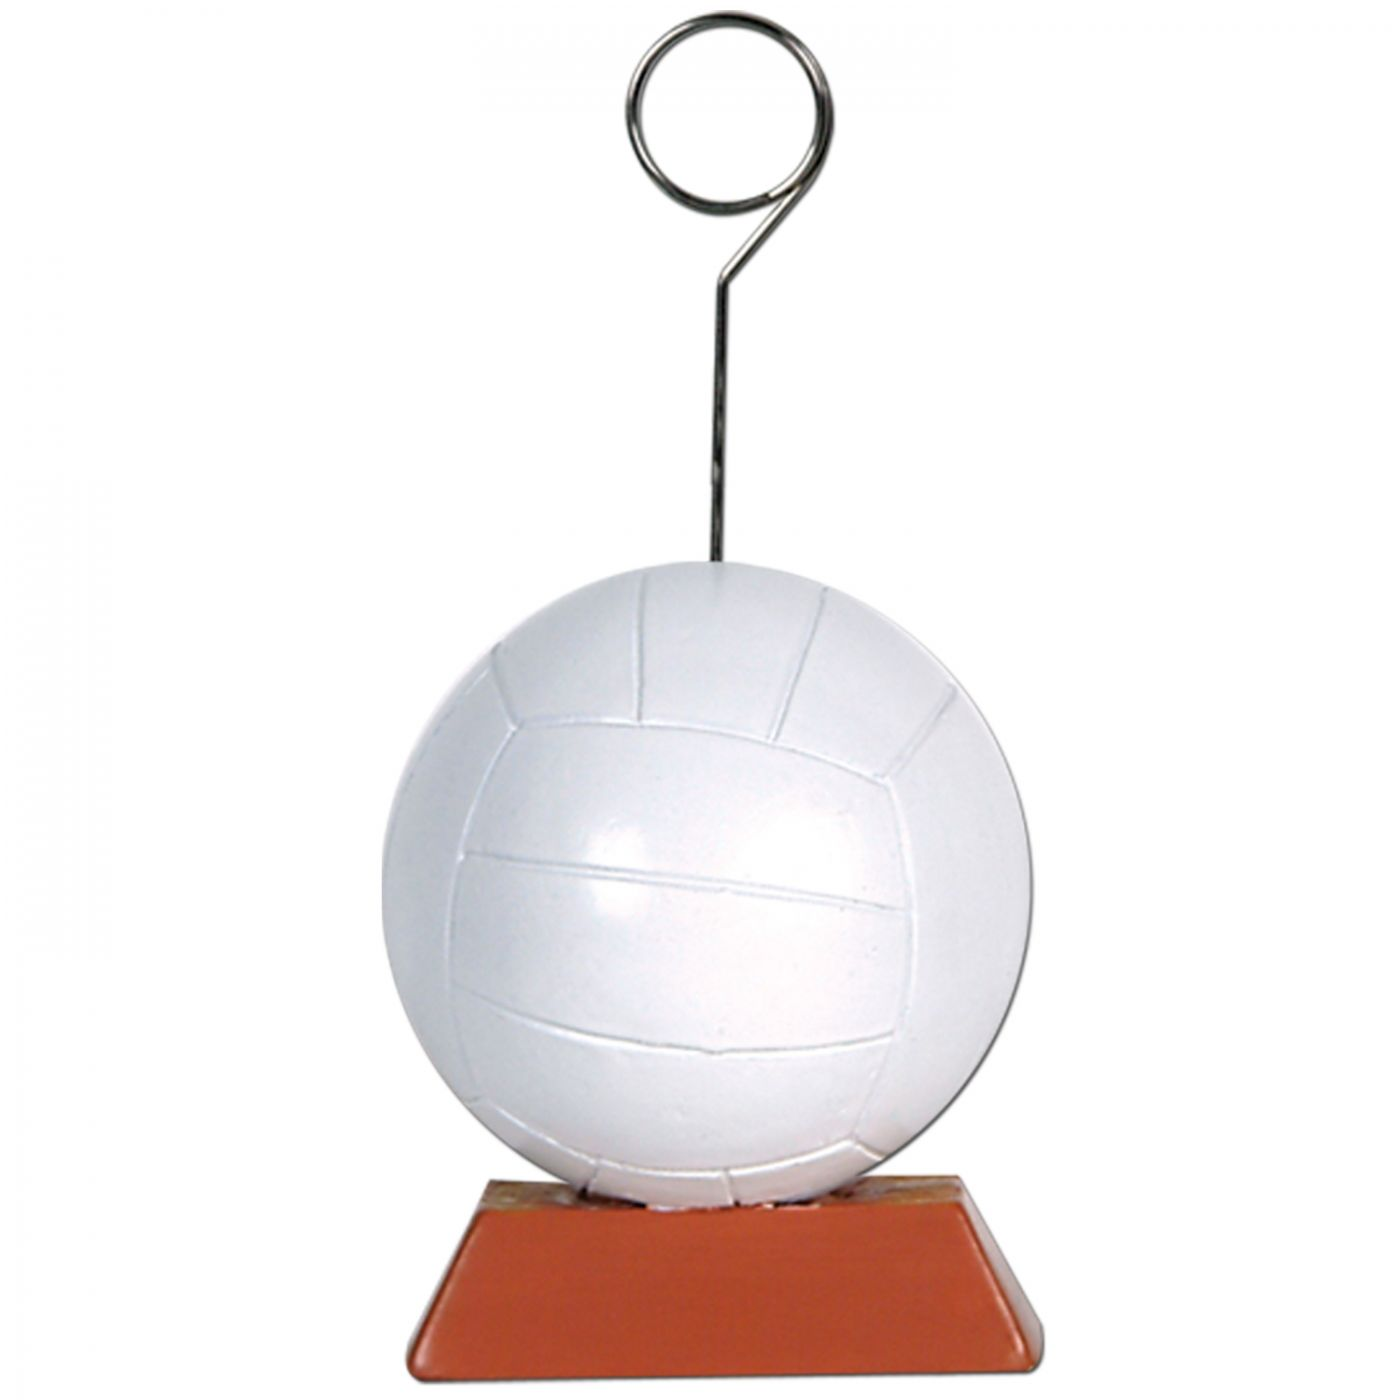 Volleyball Photo/Balloon Holder (6) image